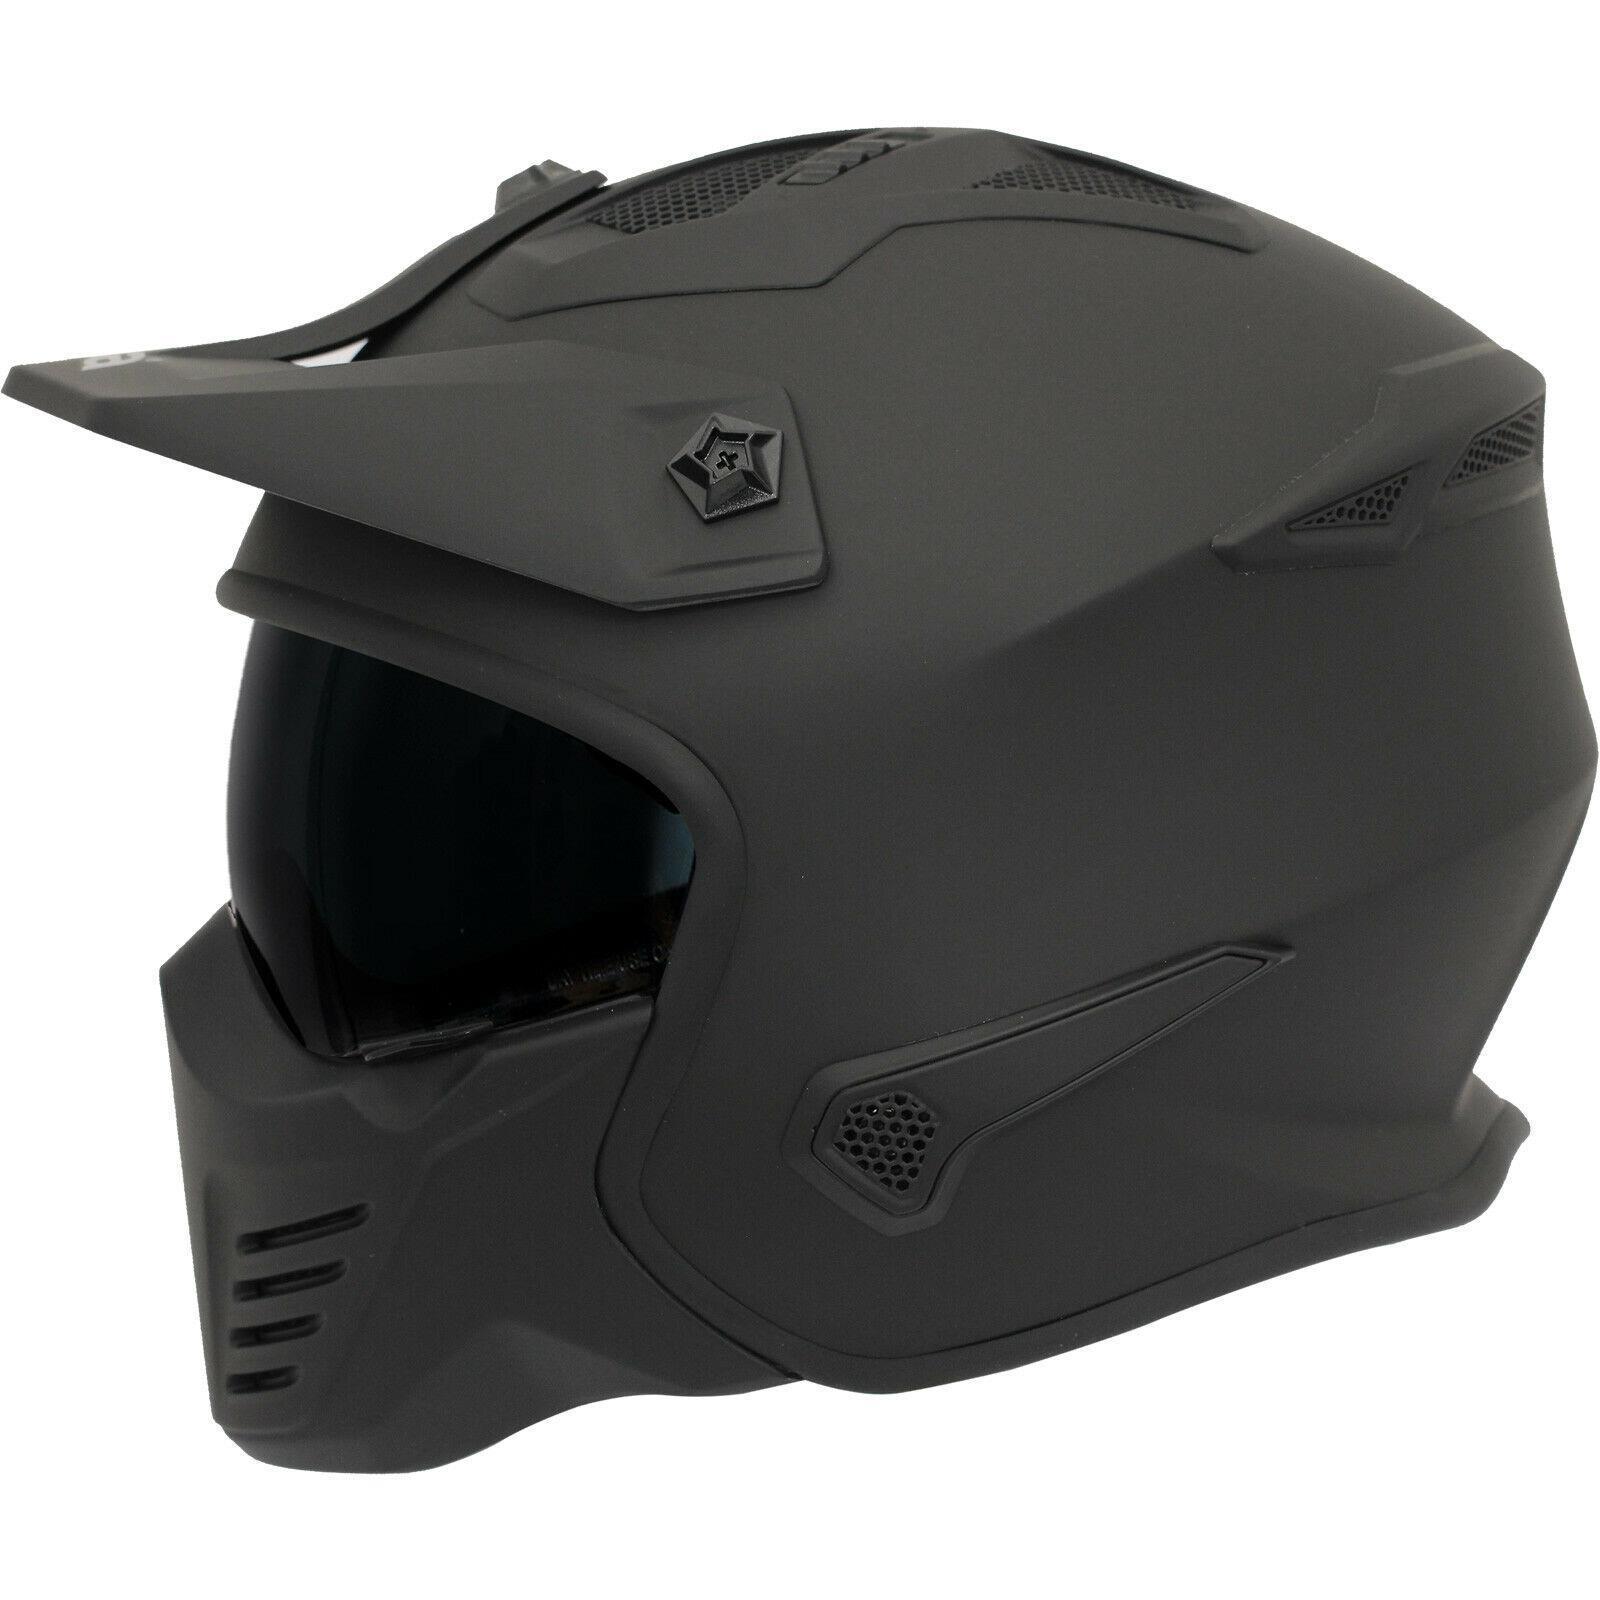 Spada-Storm-Plain-Open-Face-Motorcycle-Motorbike-Matt-Black-Sun-Visor-Helmet miniature 5